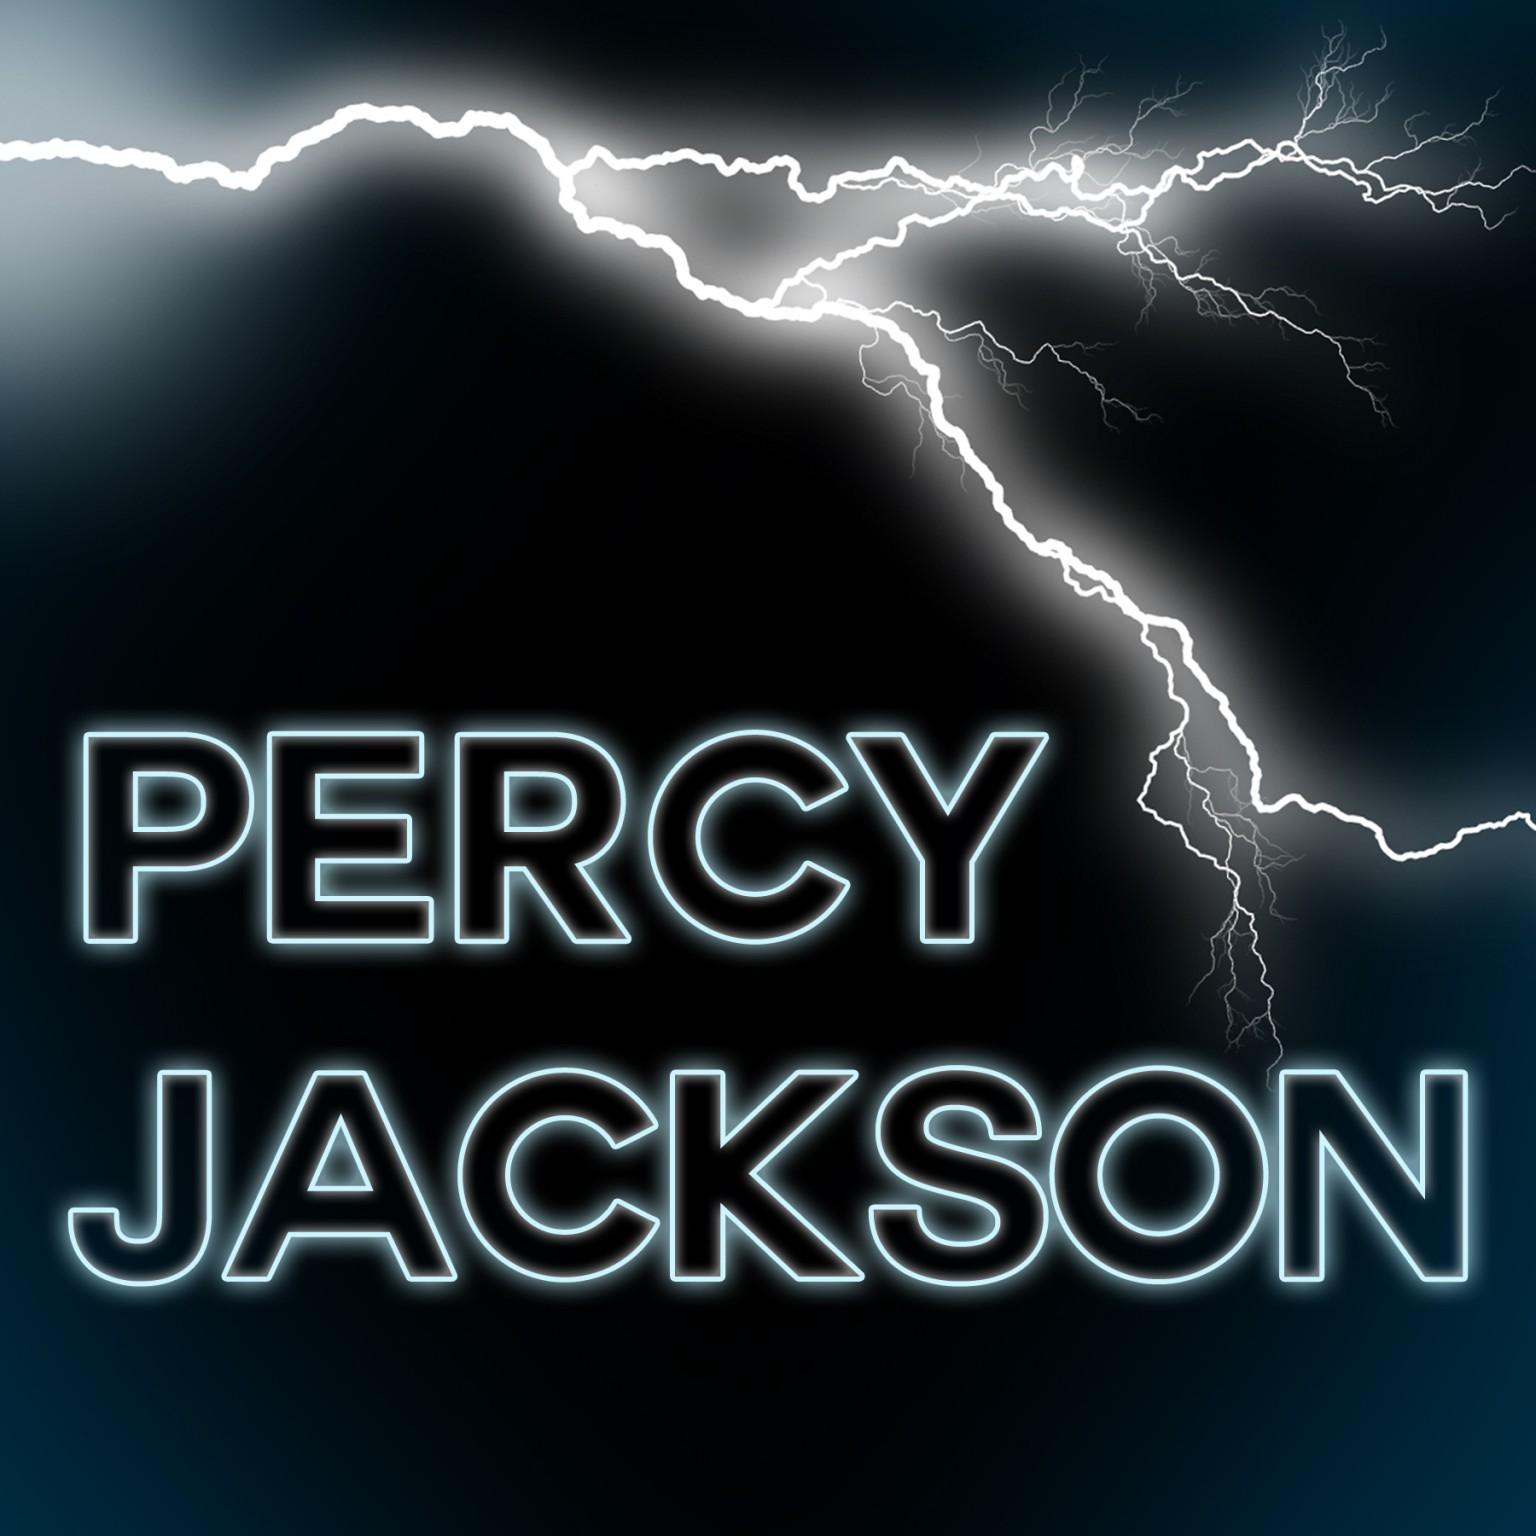 Percy Jackson2